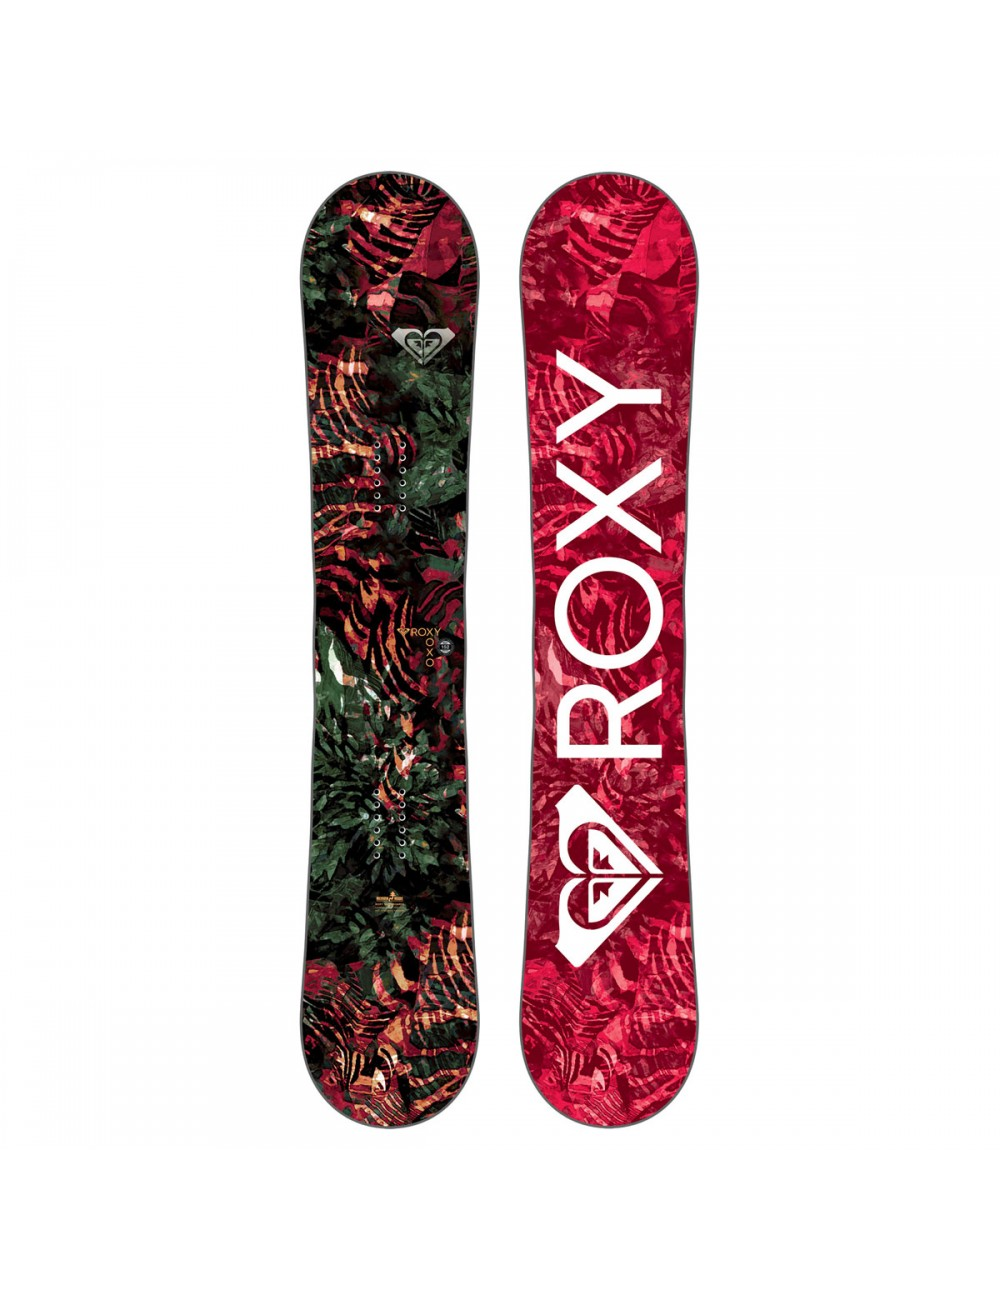 Roxy XOXO Board_1001099